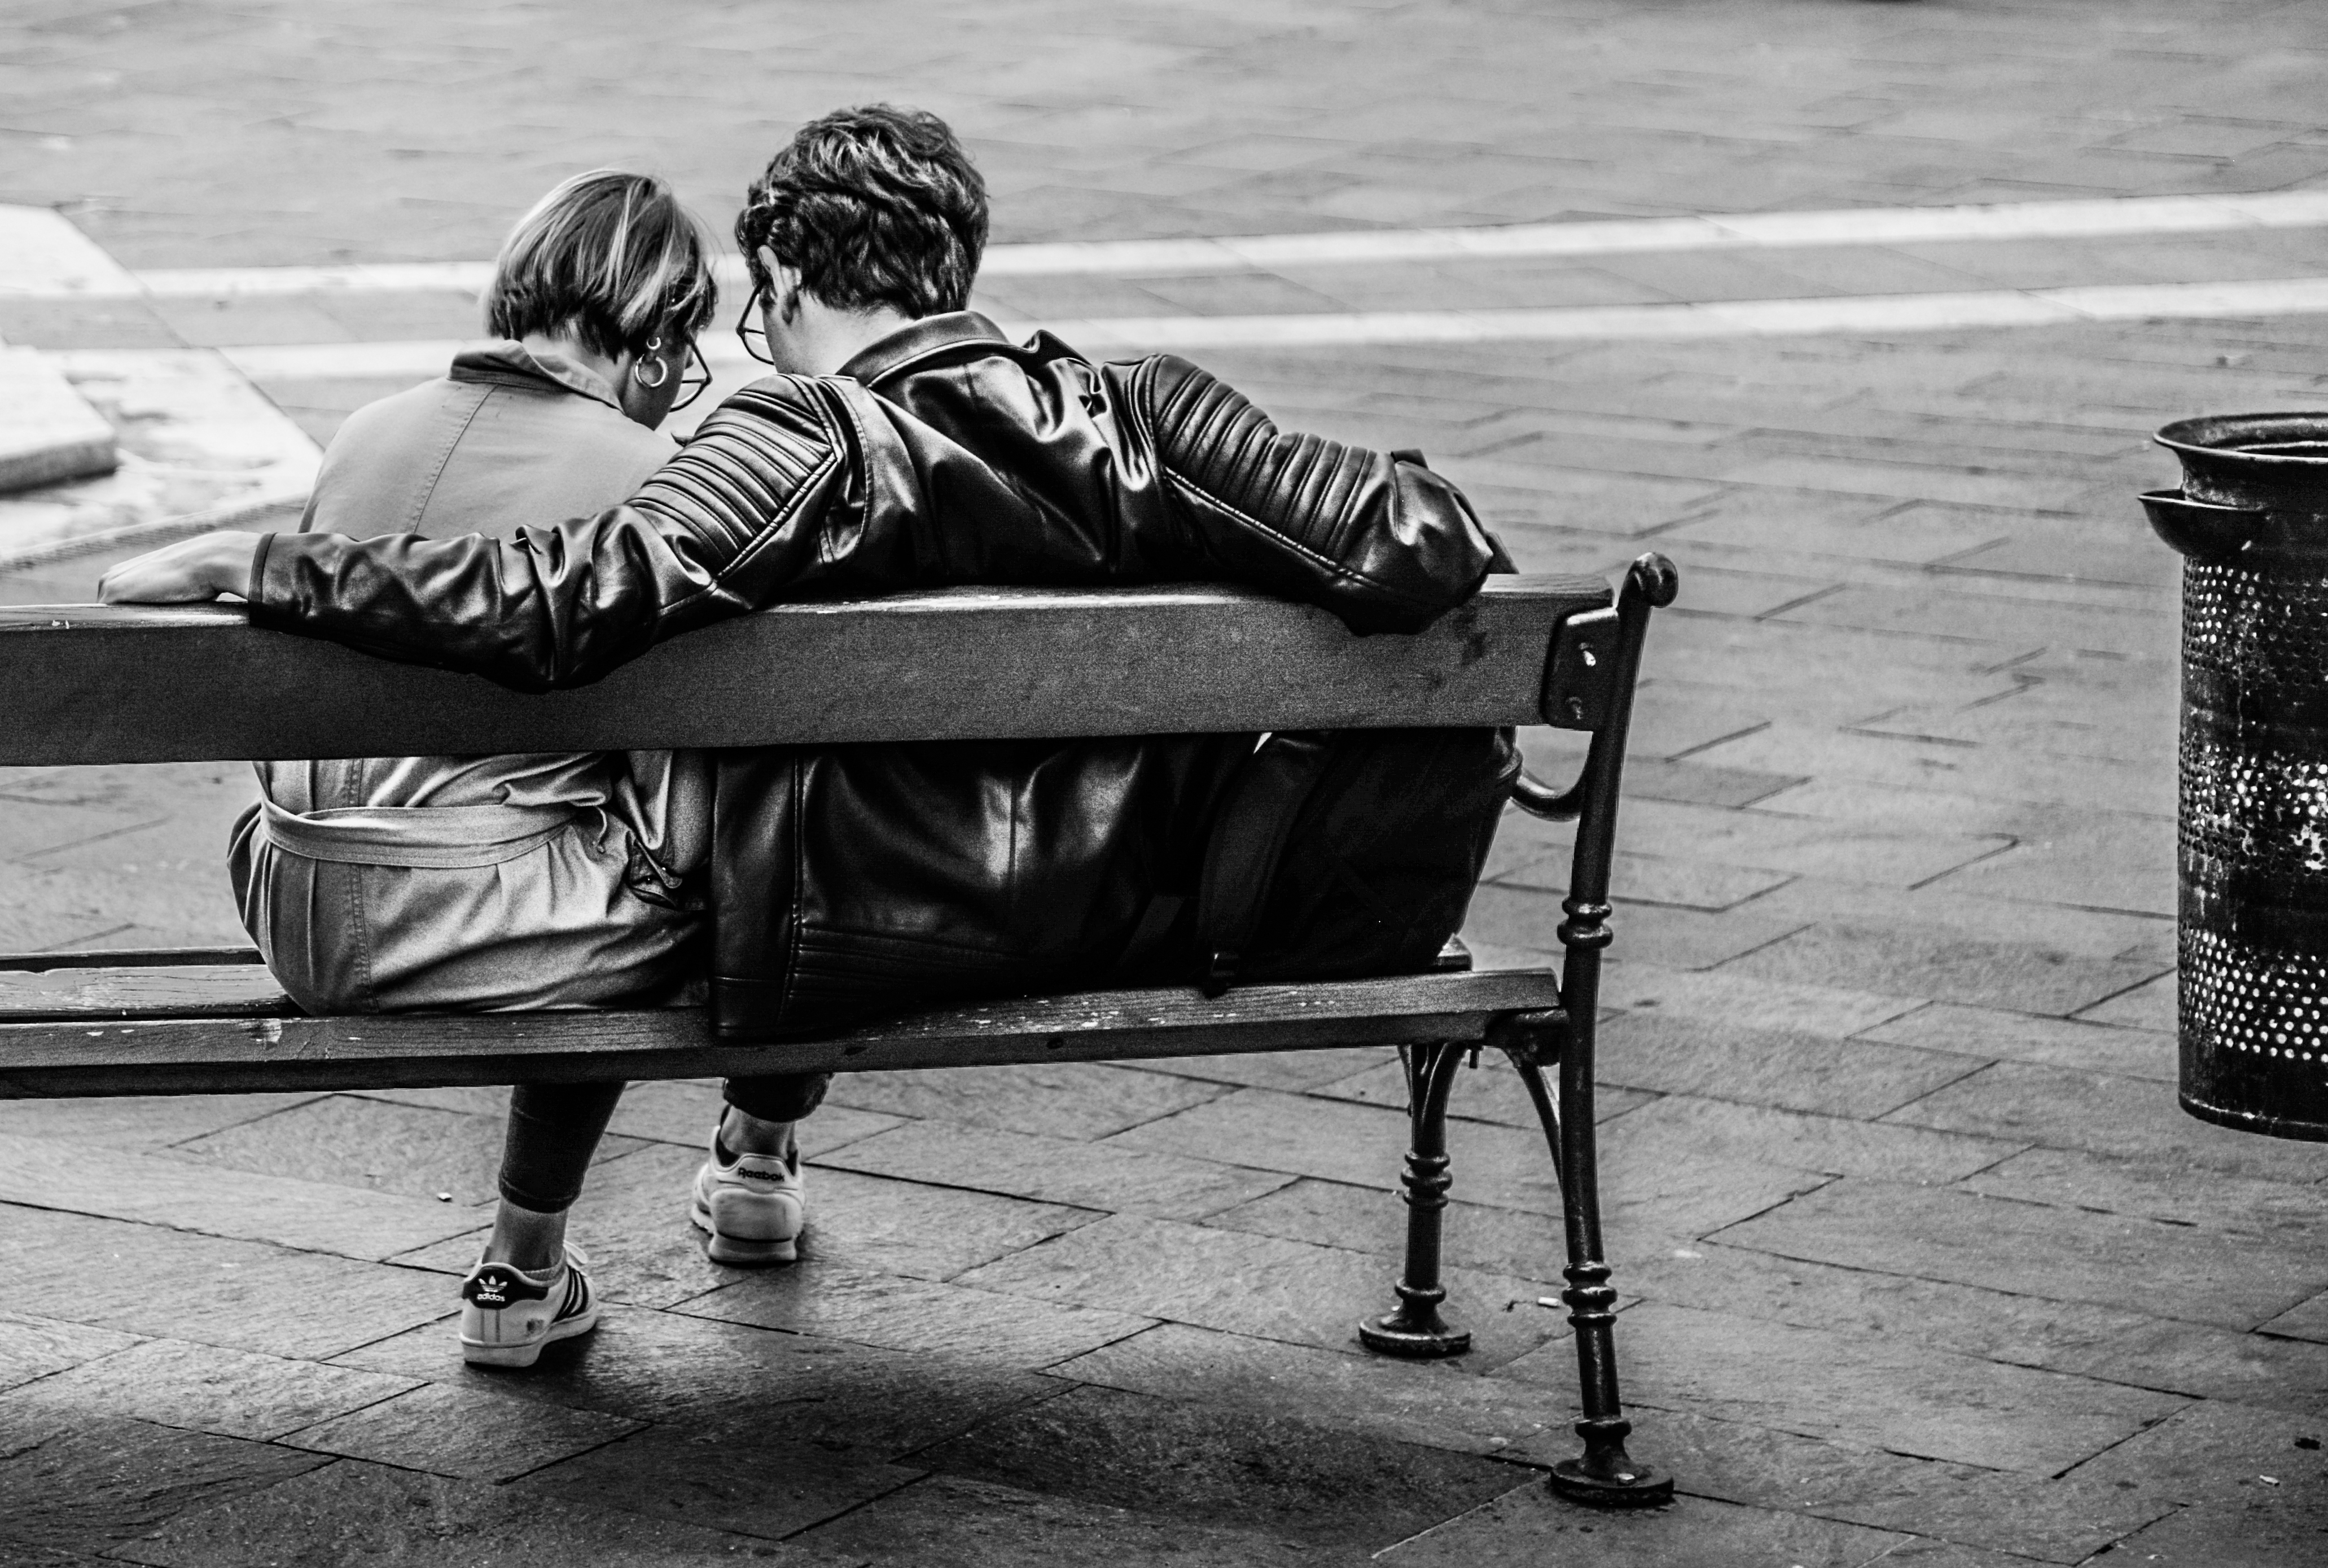 people-bench-sitting-black-and-white-602218.jpeg (4125×2779)